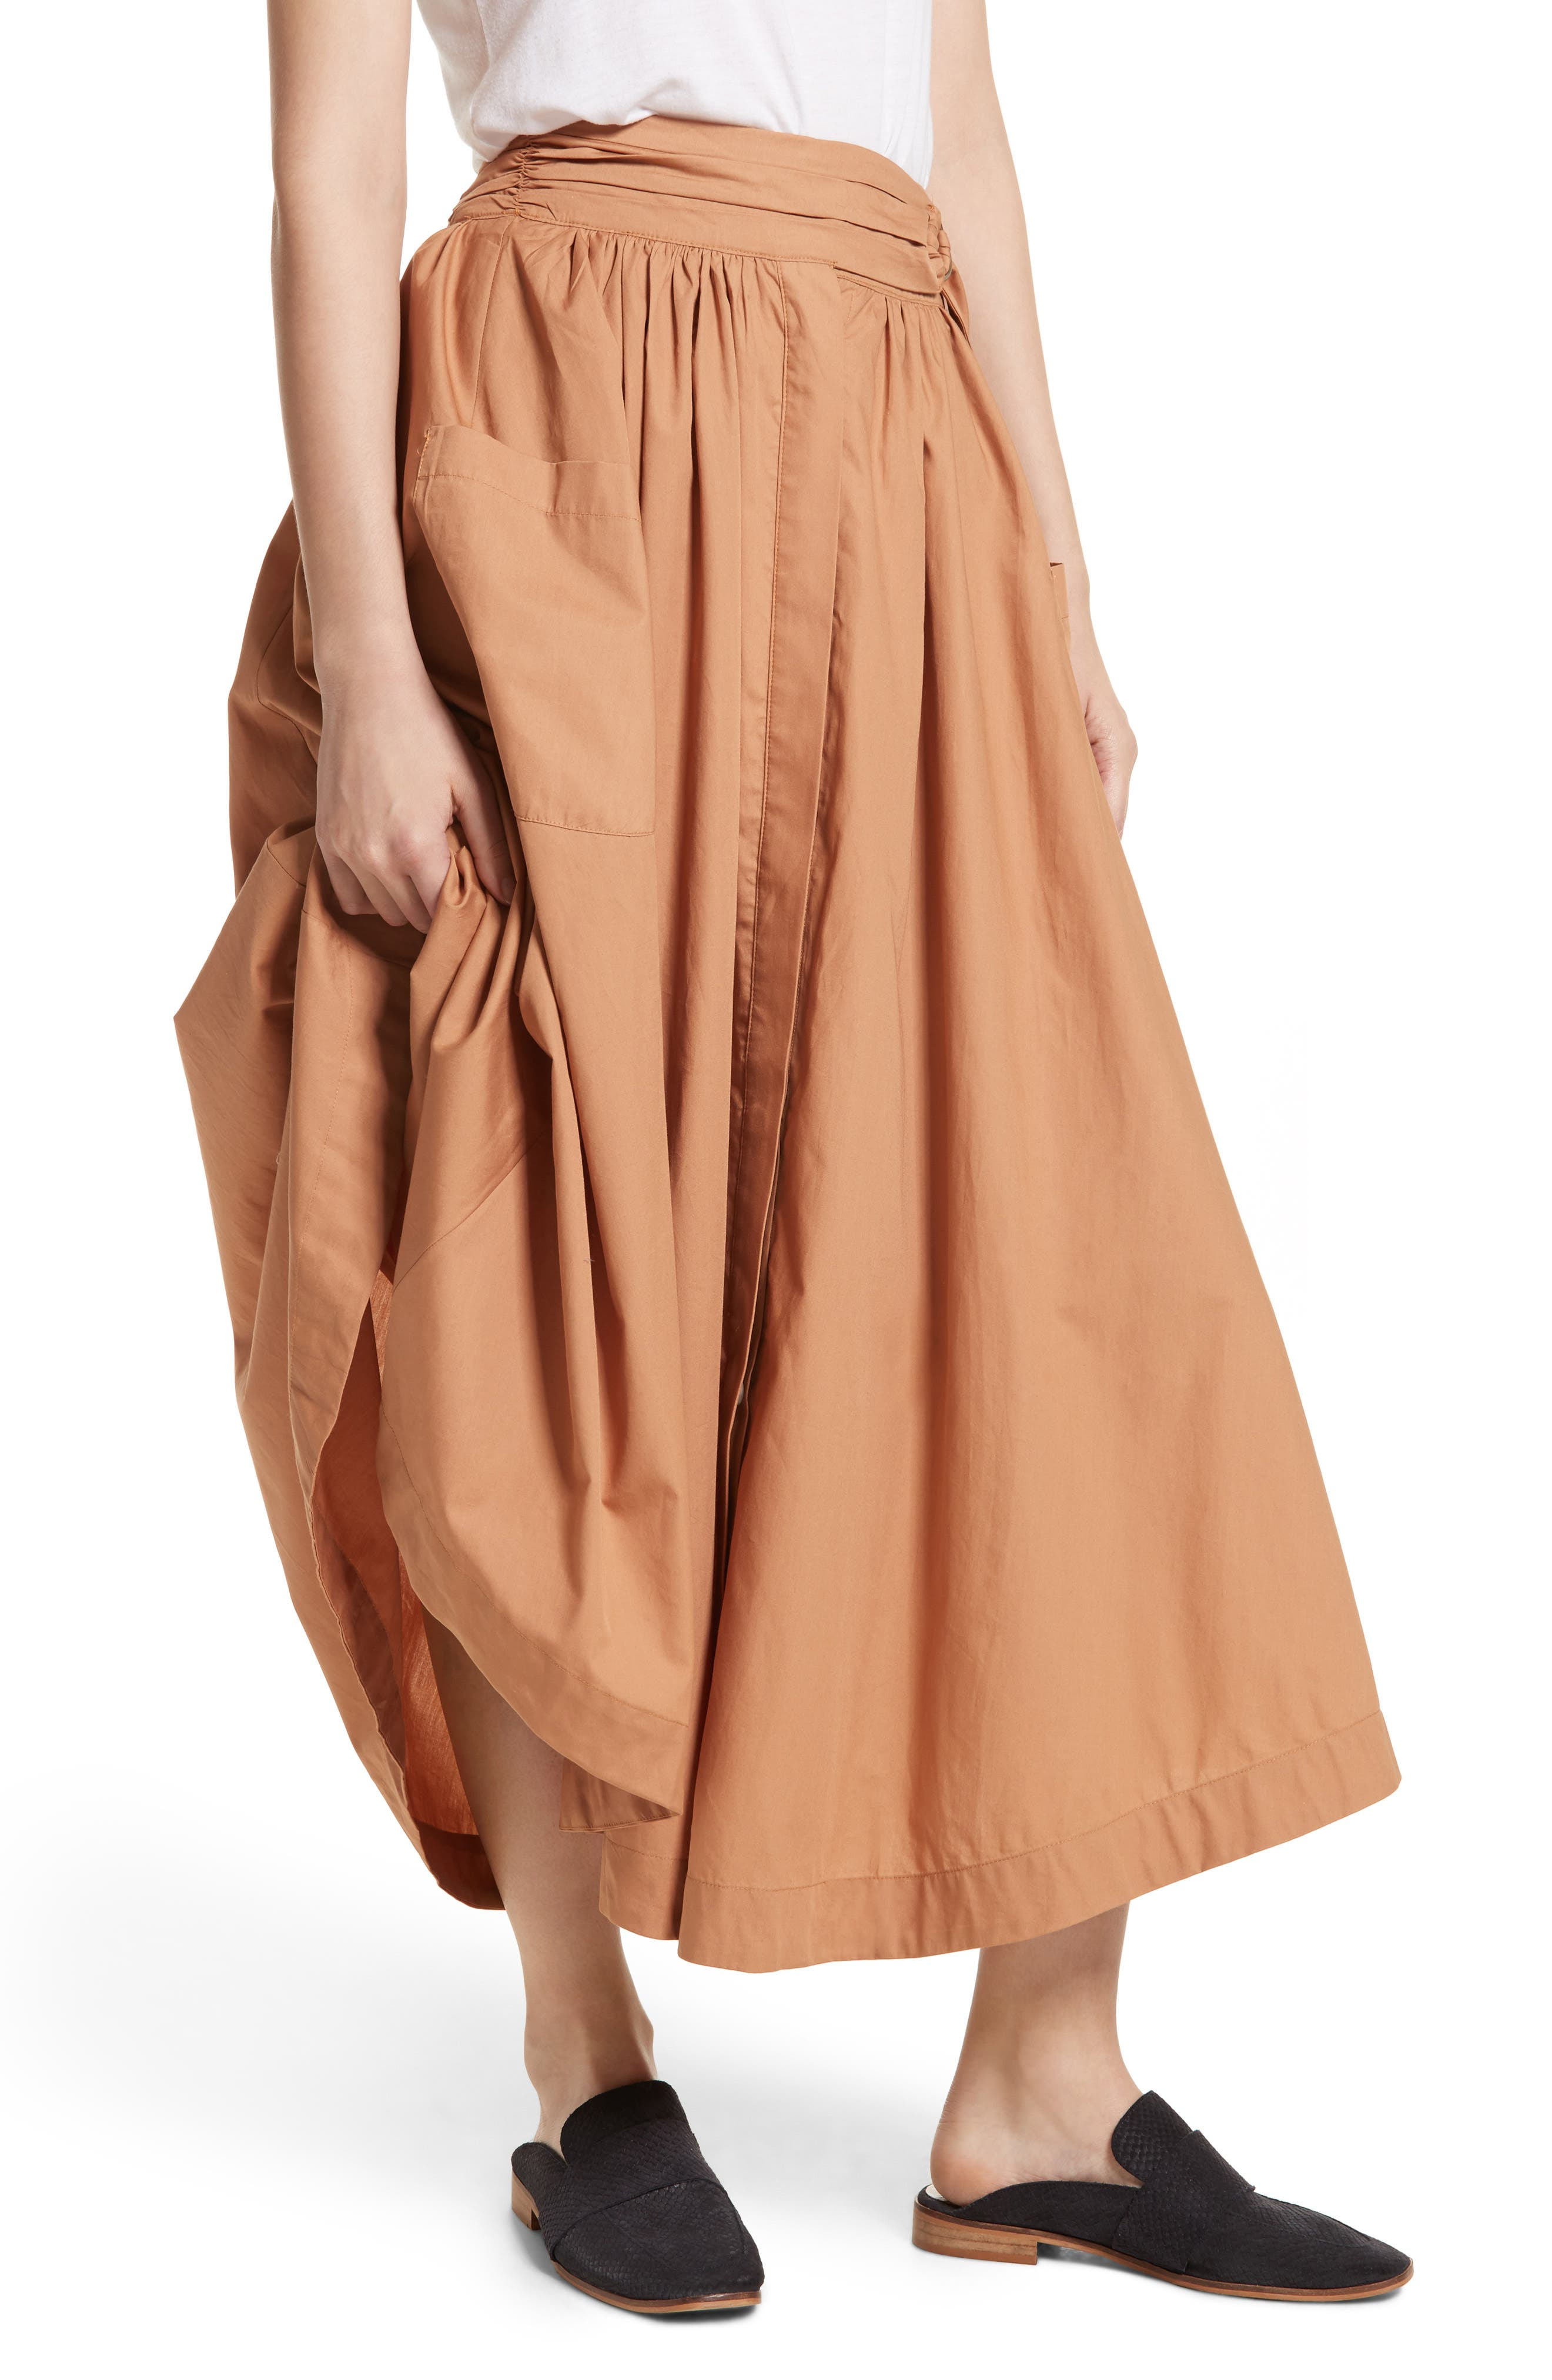 Free People Dream of Me Midi Skirt